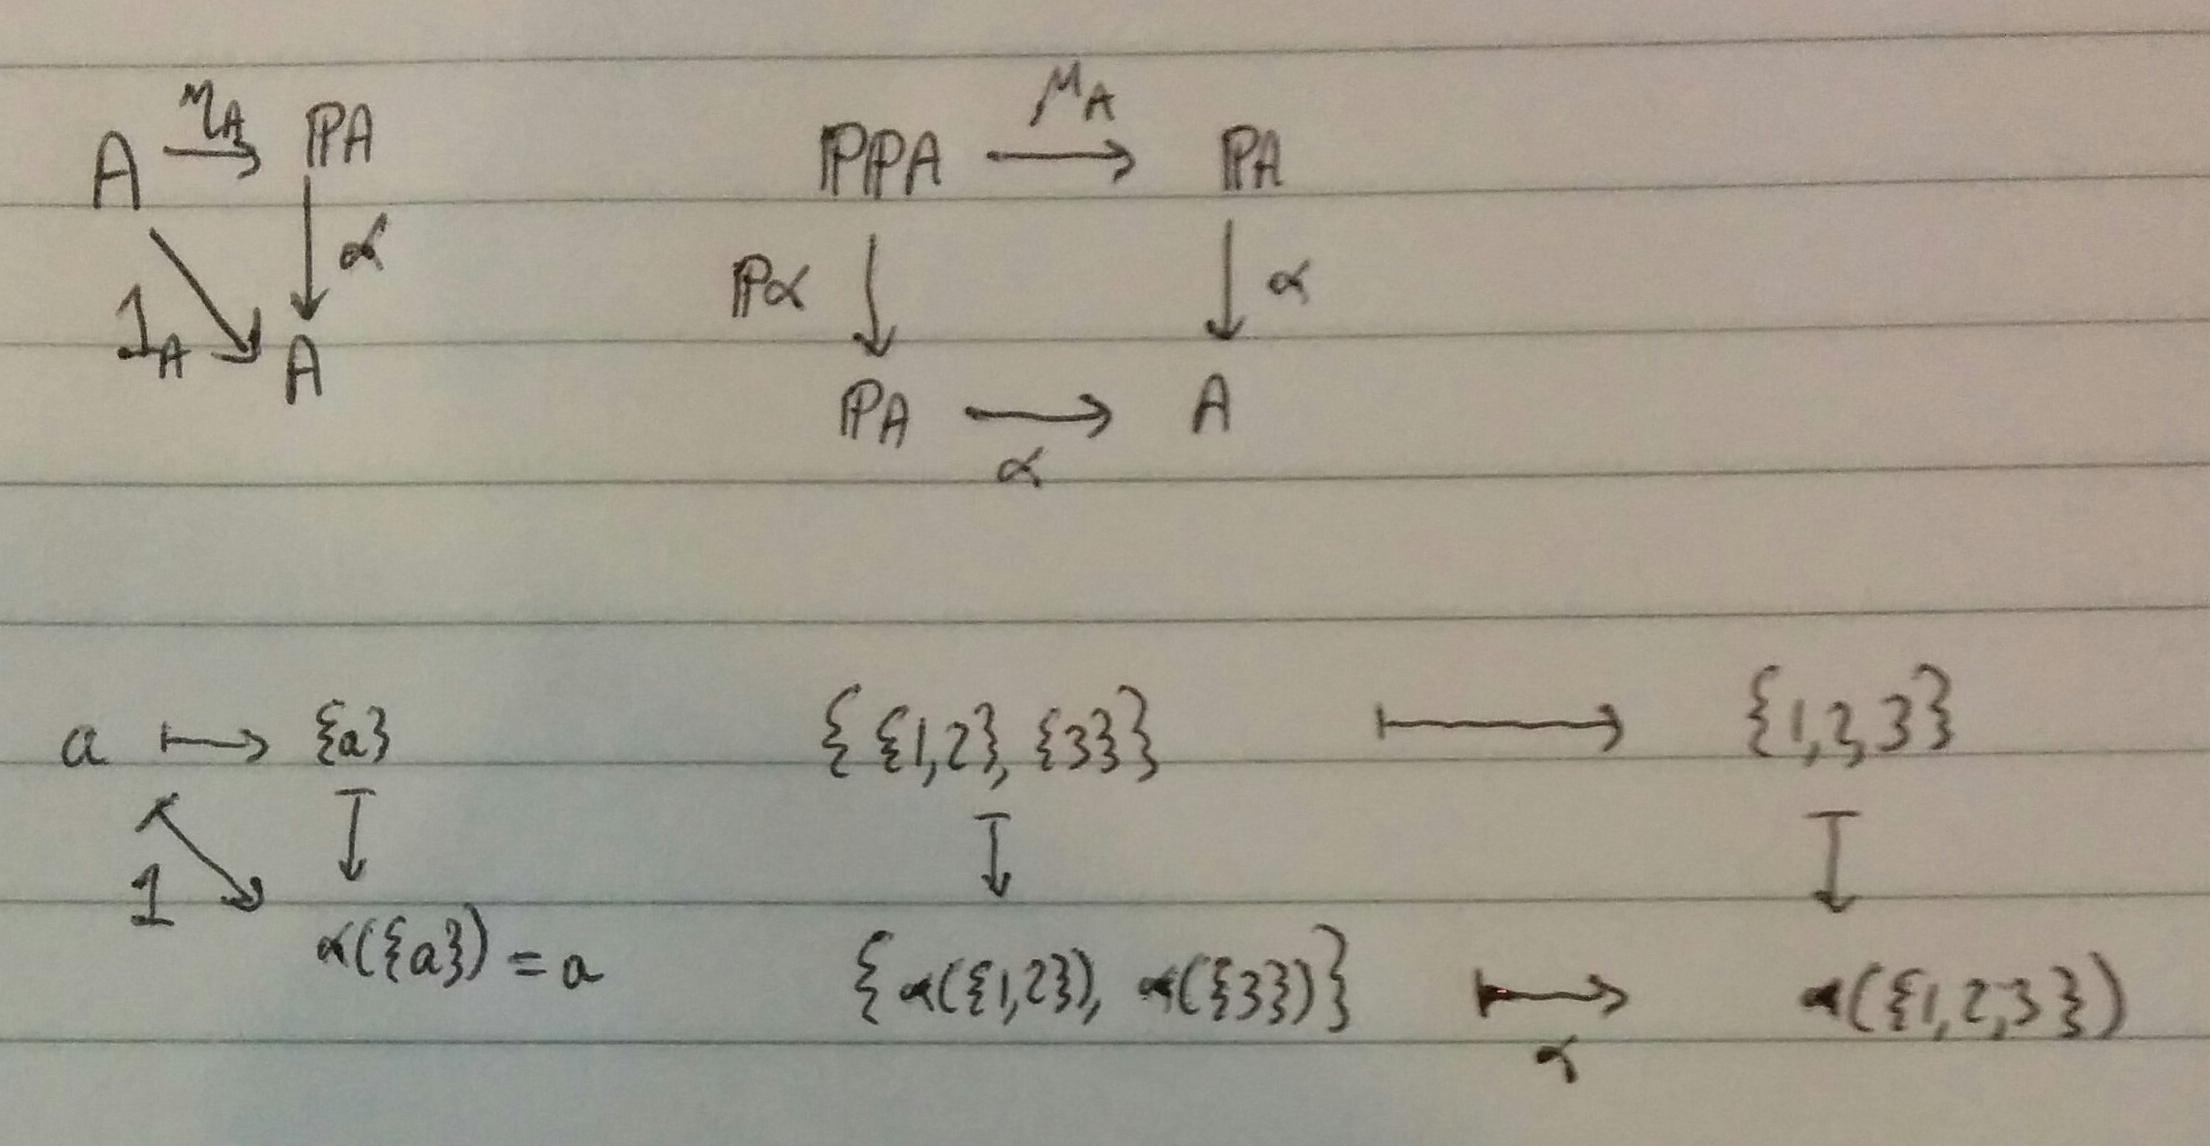 Power-set monad algebra diagram